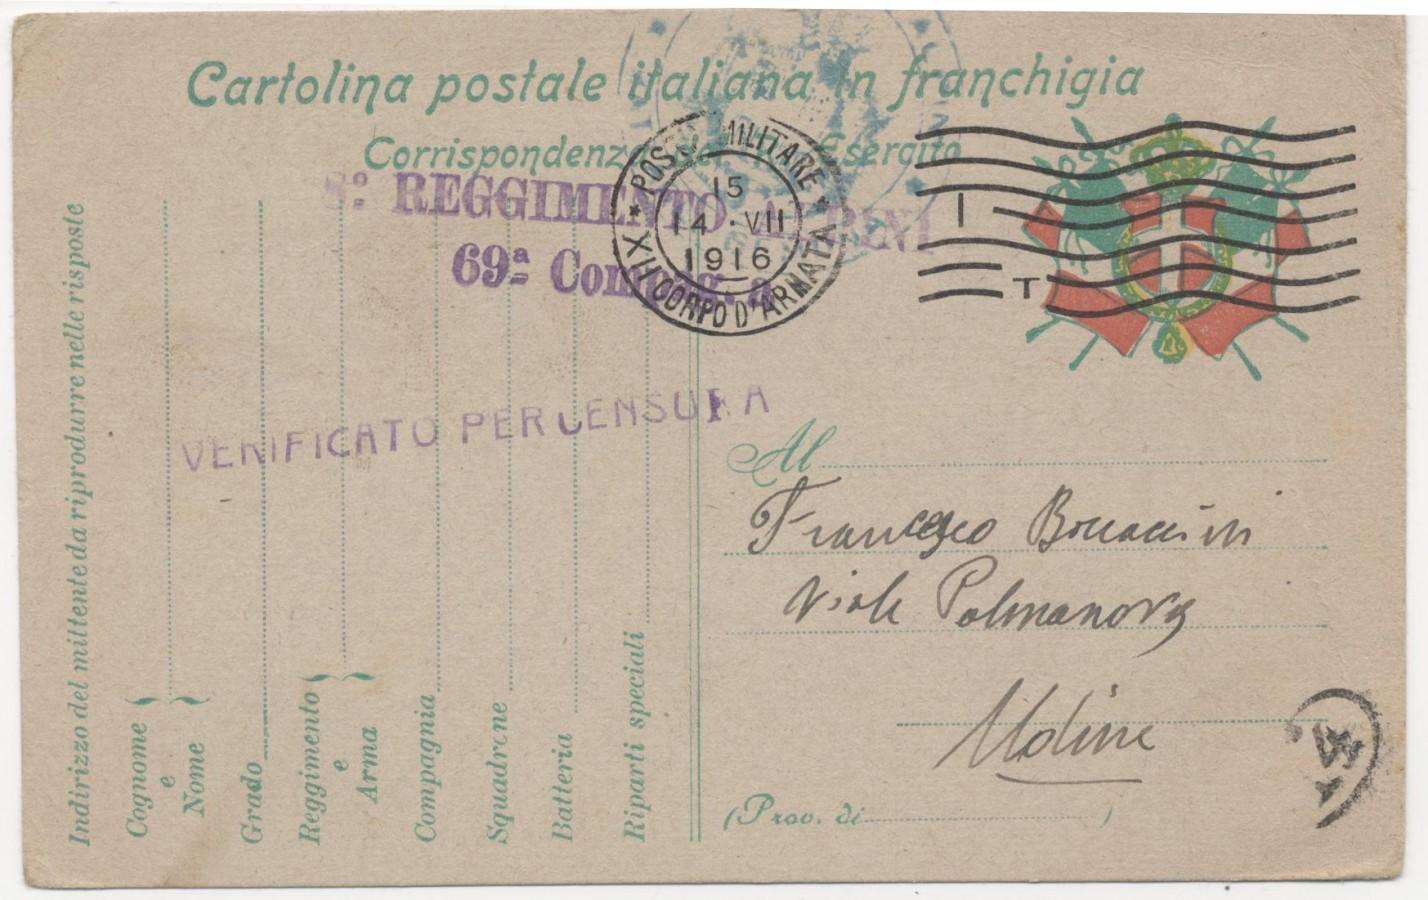 cartoline tedesco italiano 001